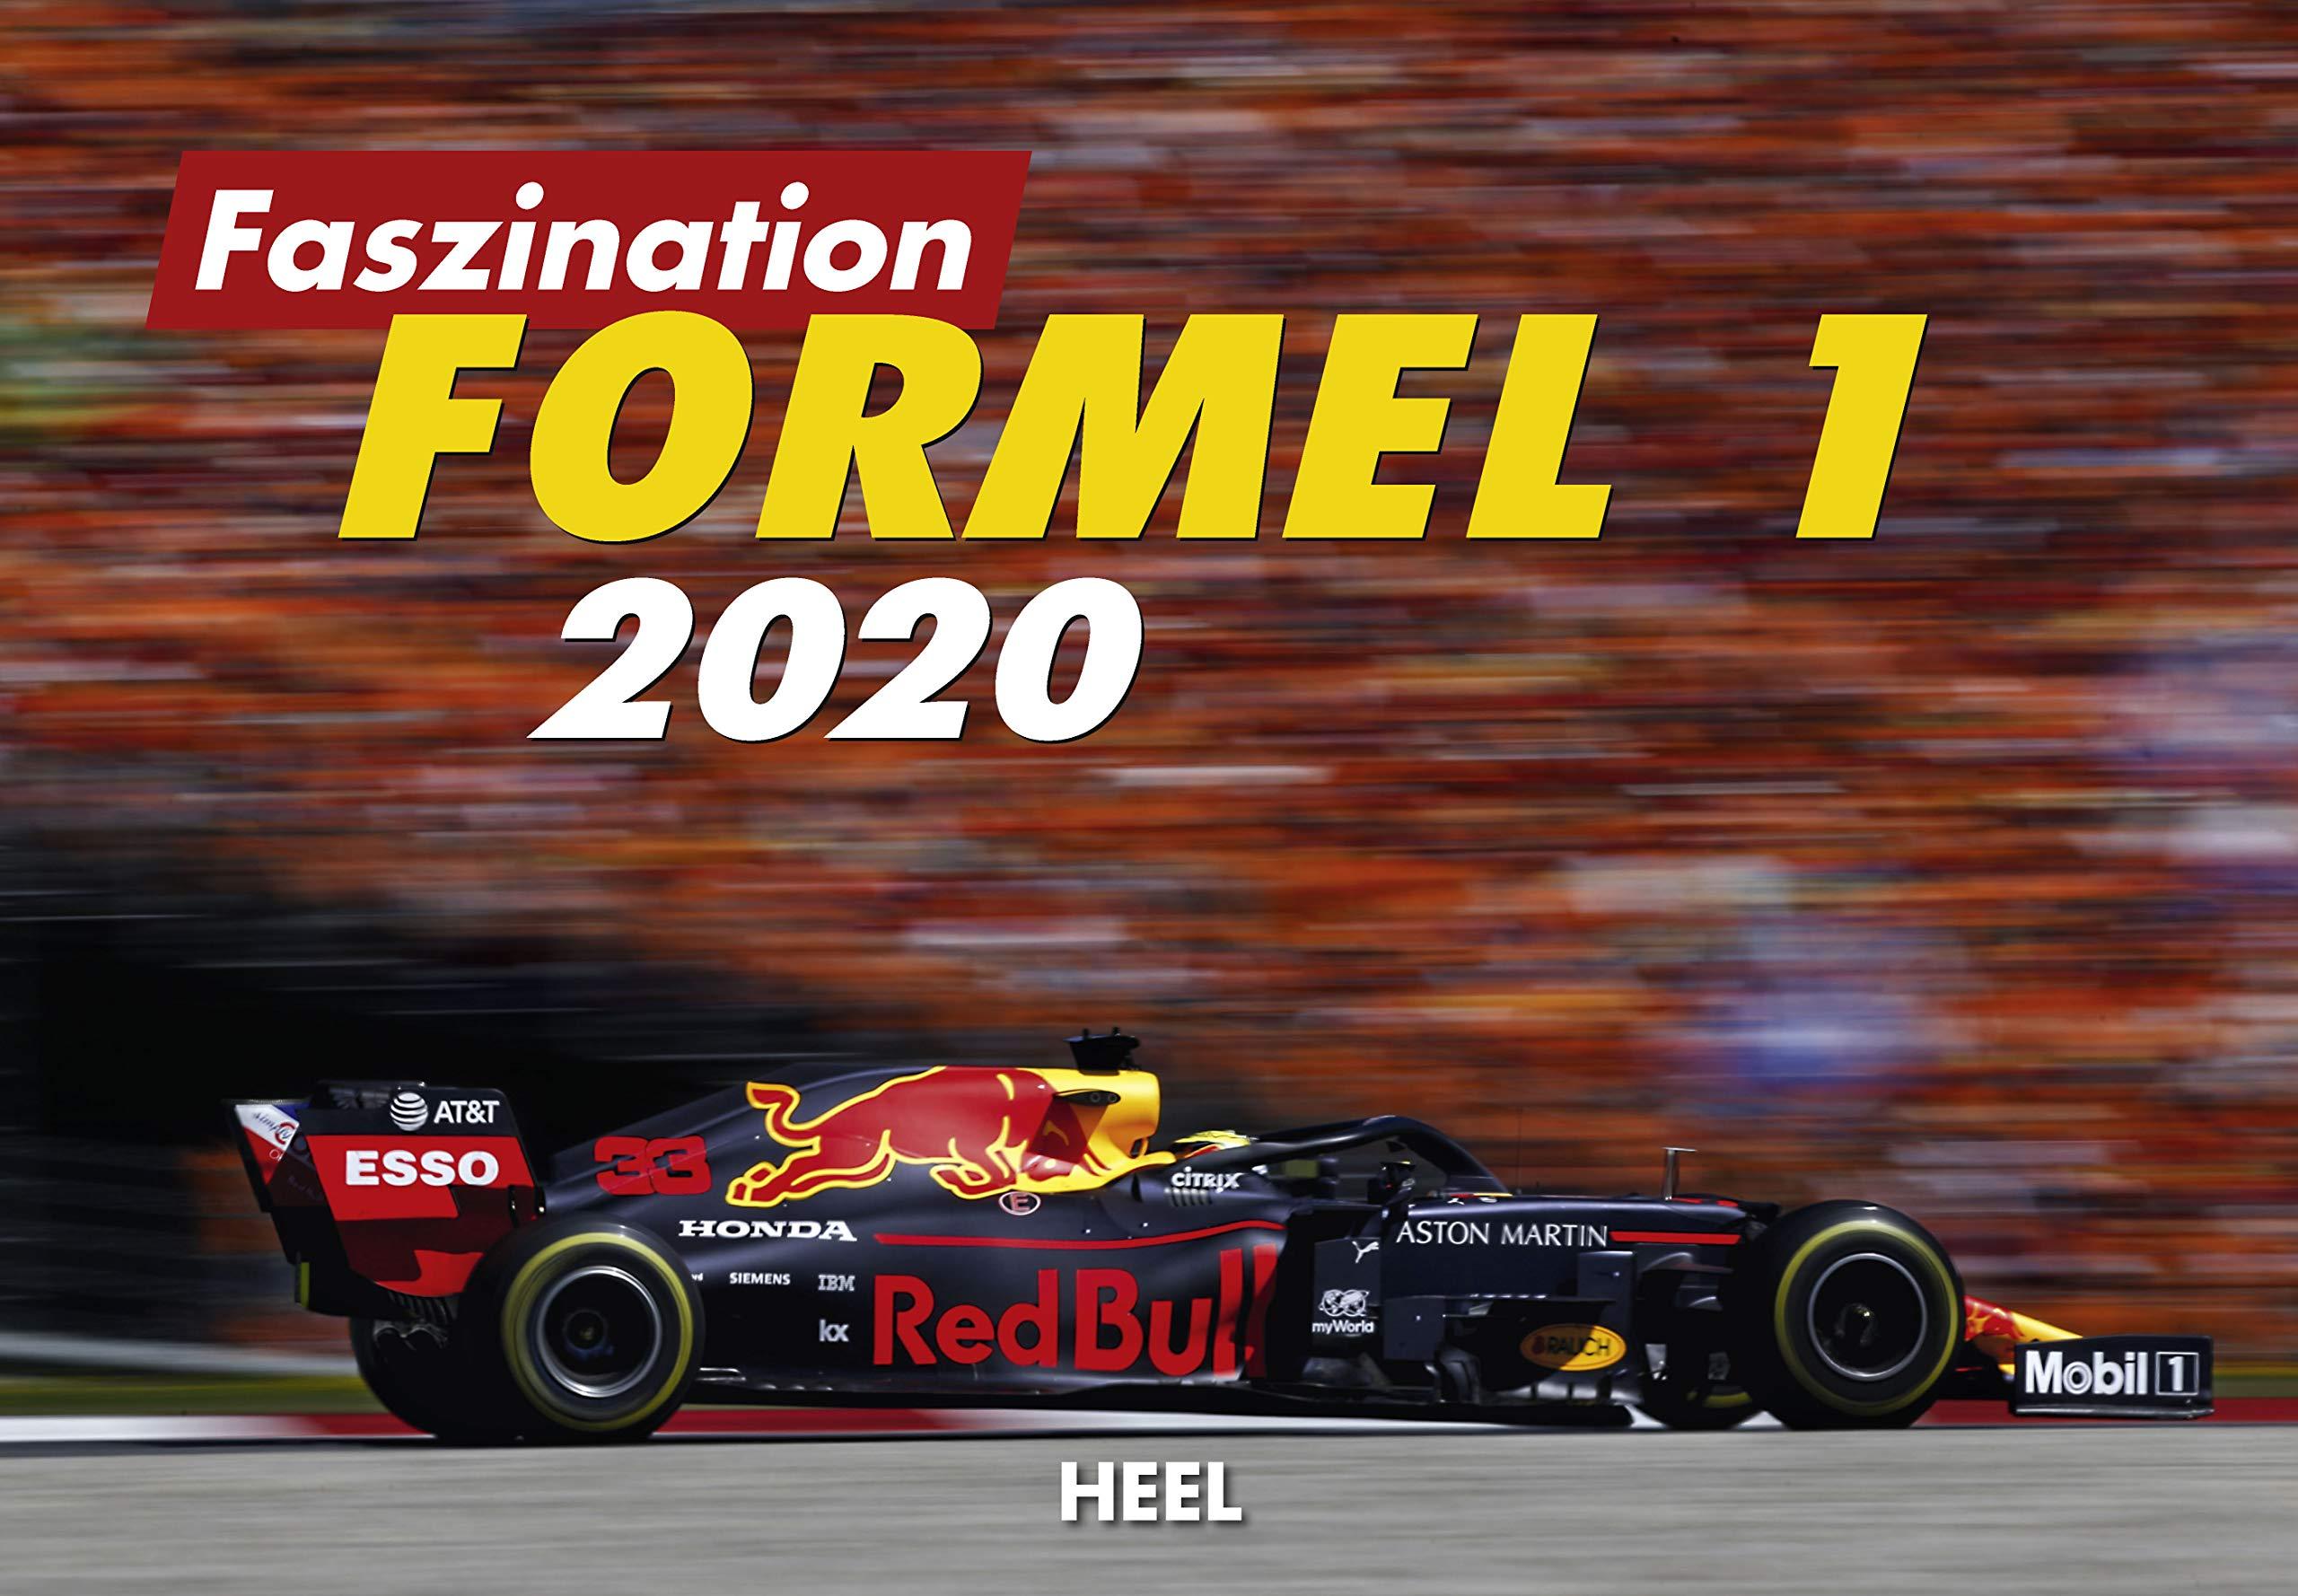 Faszination Formel 1 2020: Grand Prix in der Königsklasse des Motorsports